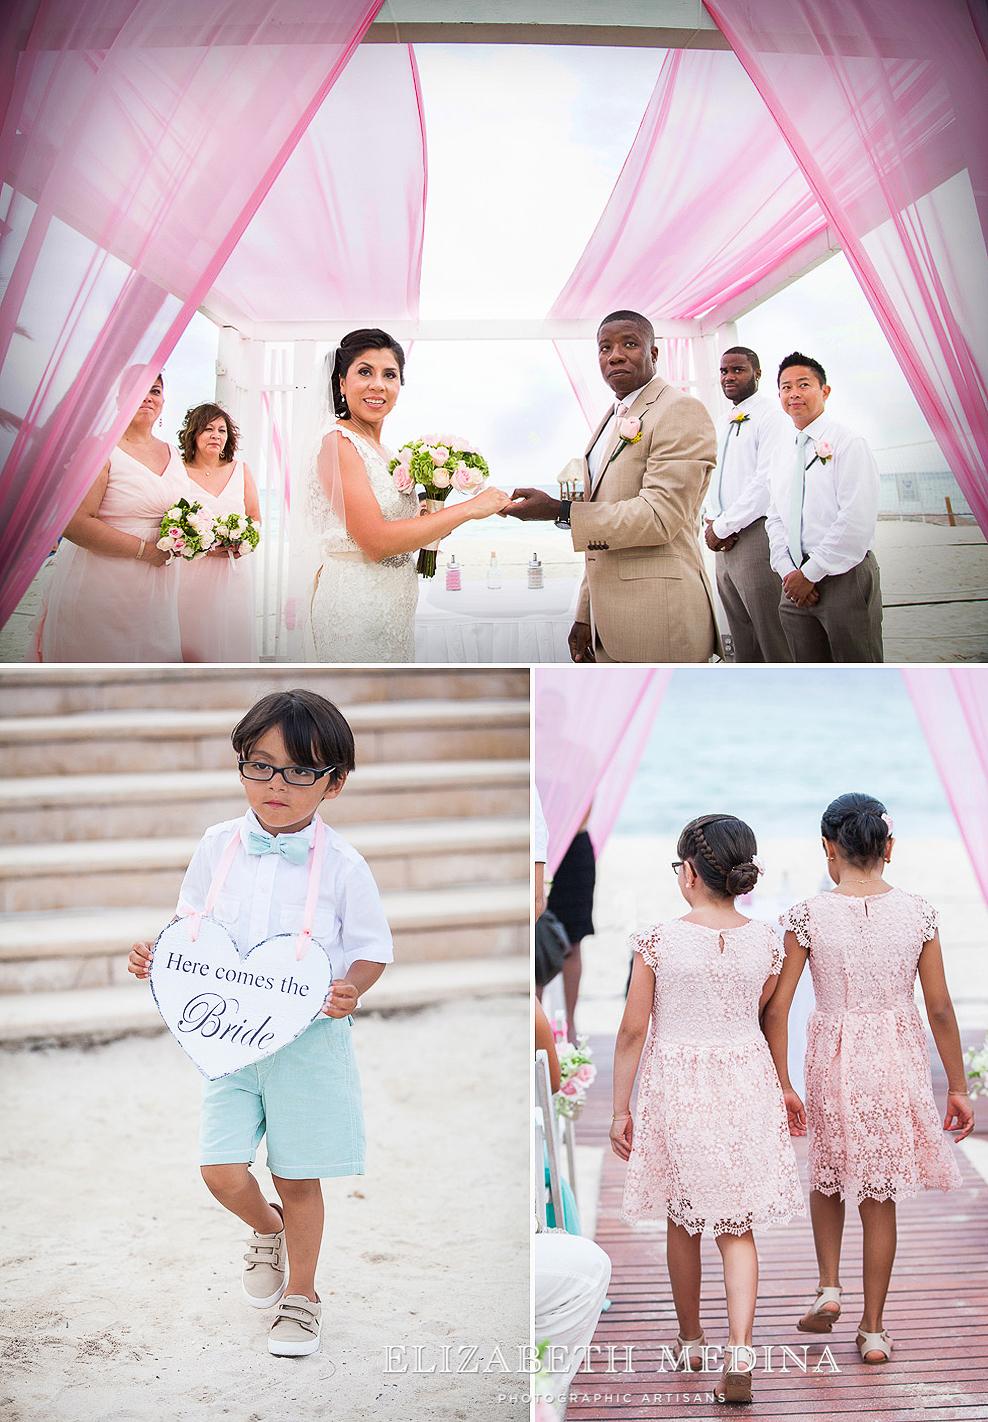 azul fives wedding photography elizabeth medina_004 2 Azul Fives Wedding, Noemi and Patrick,  Riviera Maya Mexico